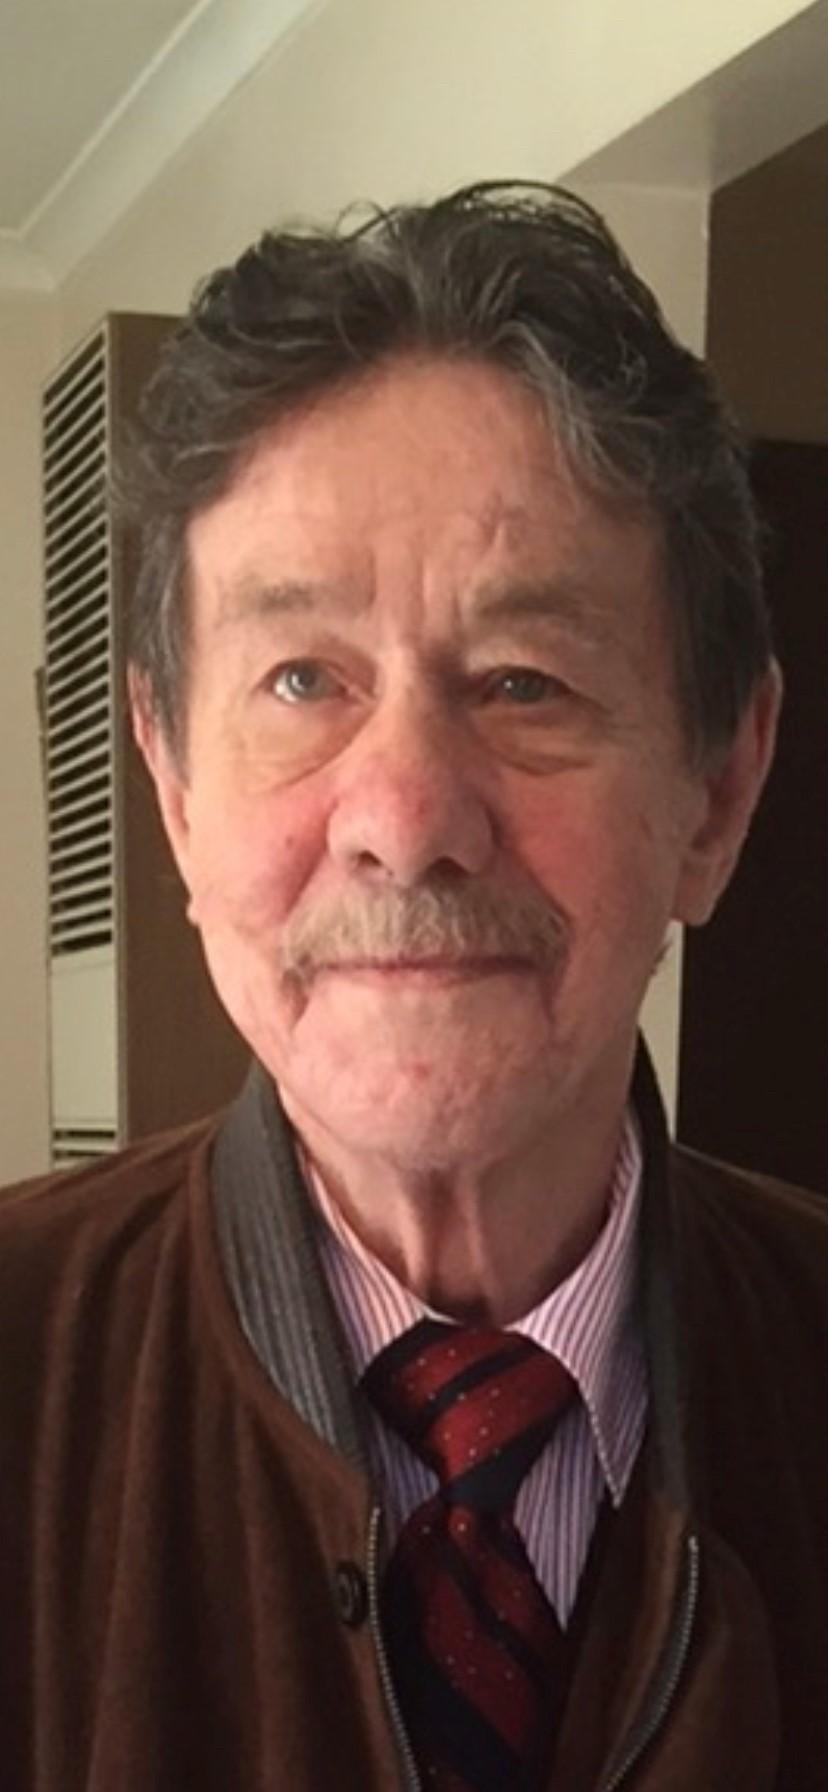 Peter Julian Beaumont